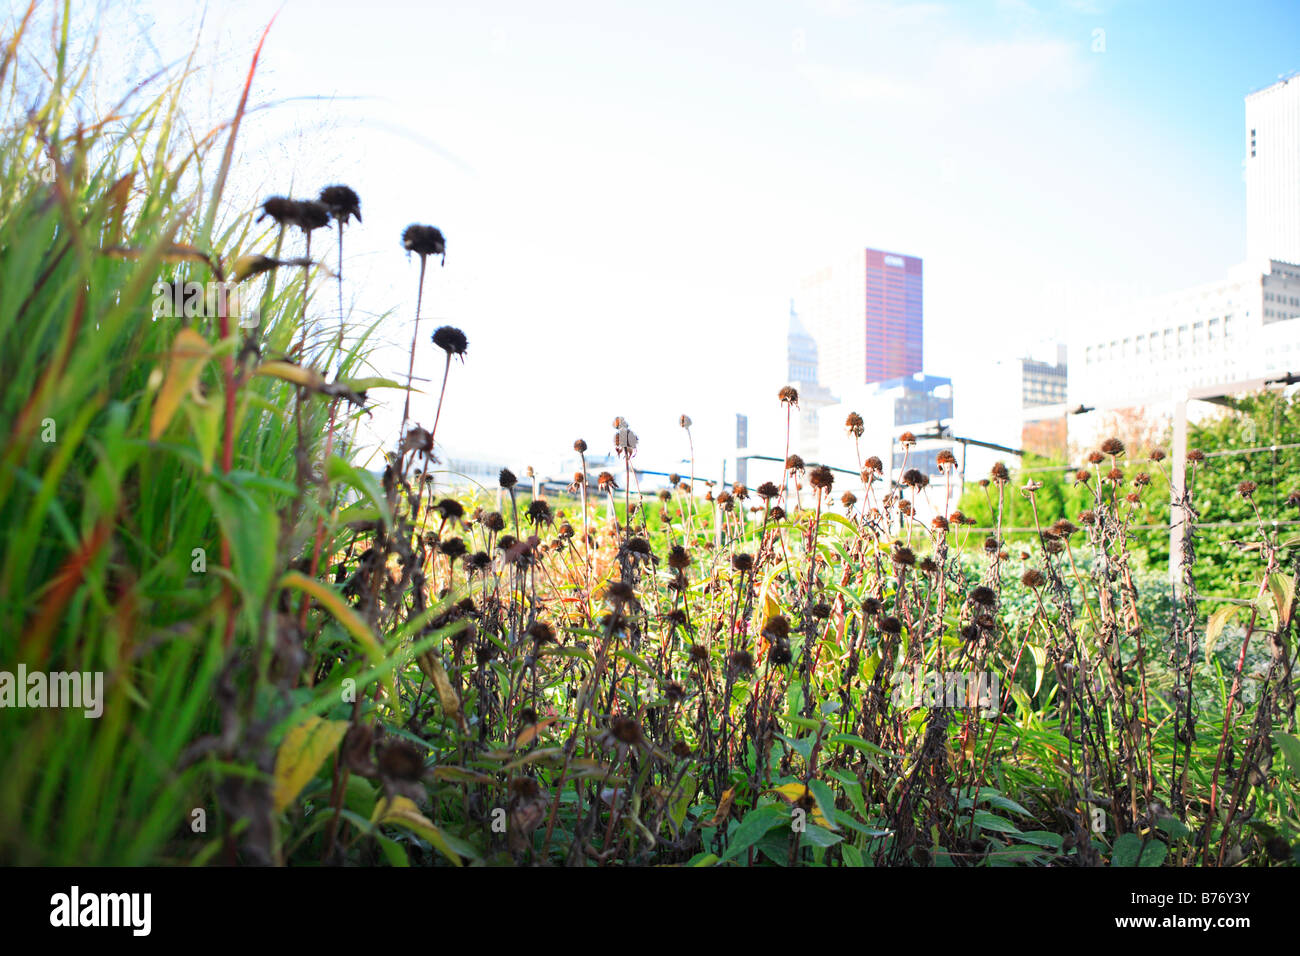 PRAIRIE STYLE LURIE GARDEN IN MILLENIUM PARK IN DOWNTOWN CHICAGO ILLLINOIS USA - Stock Image